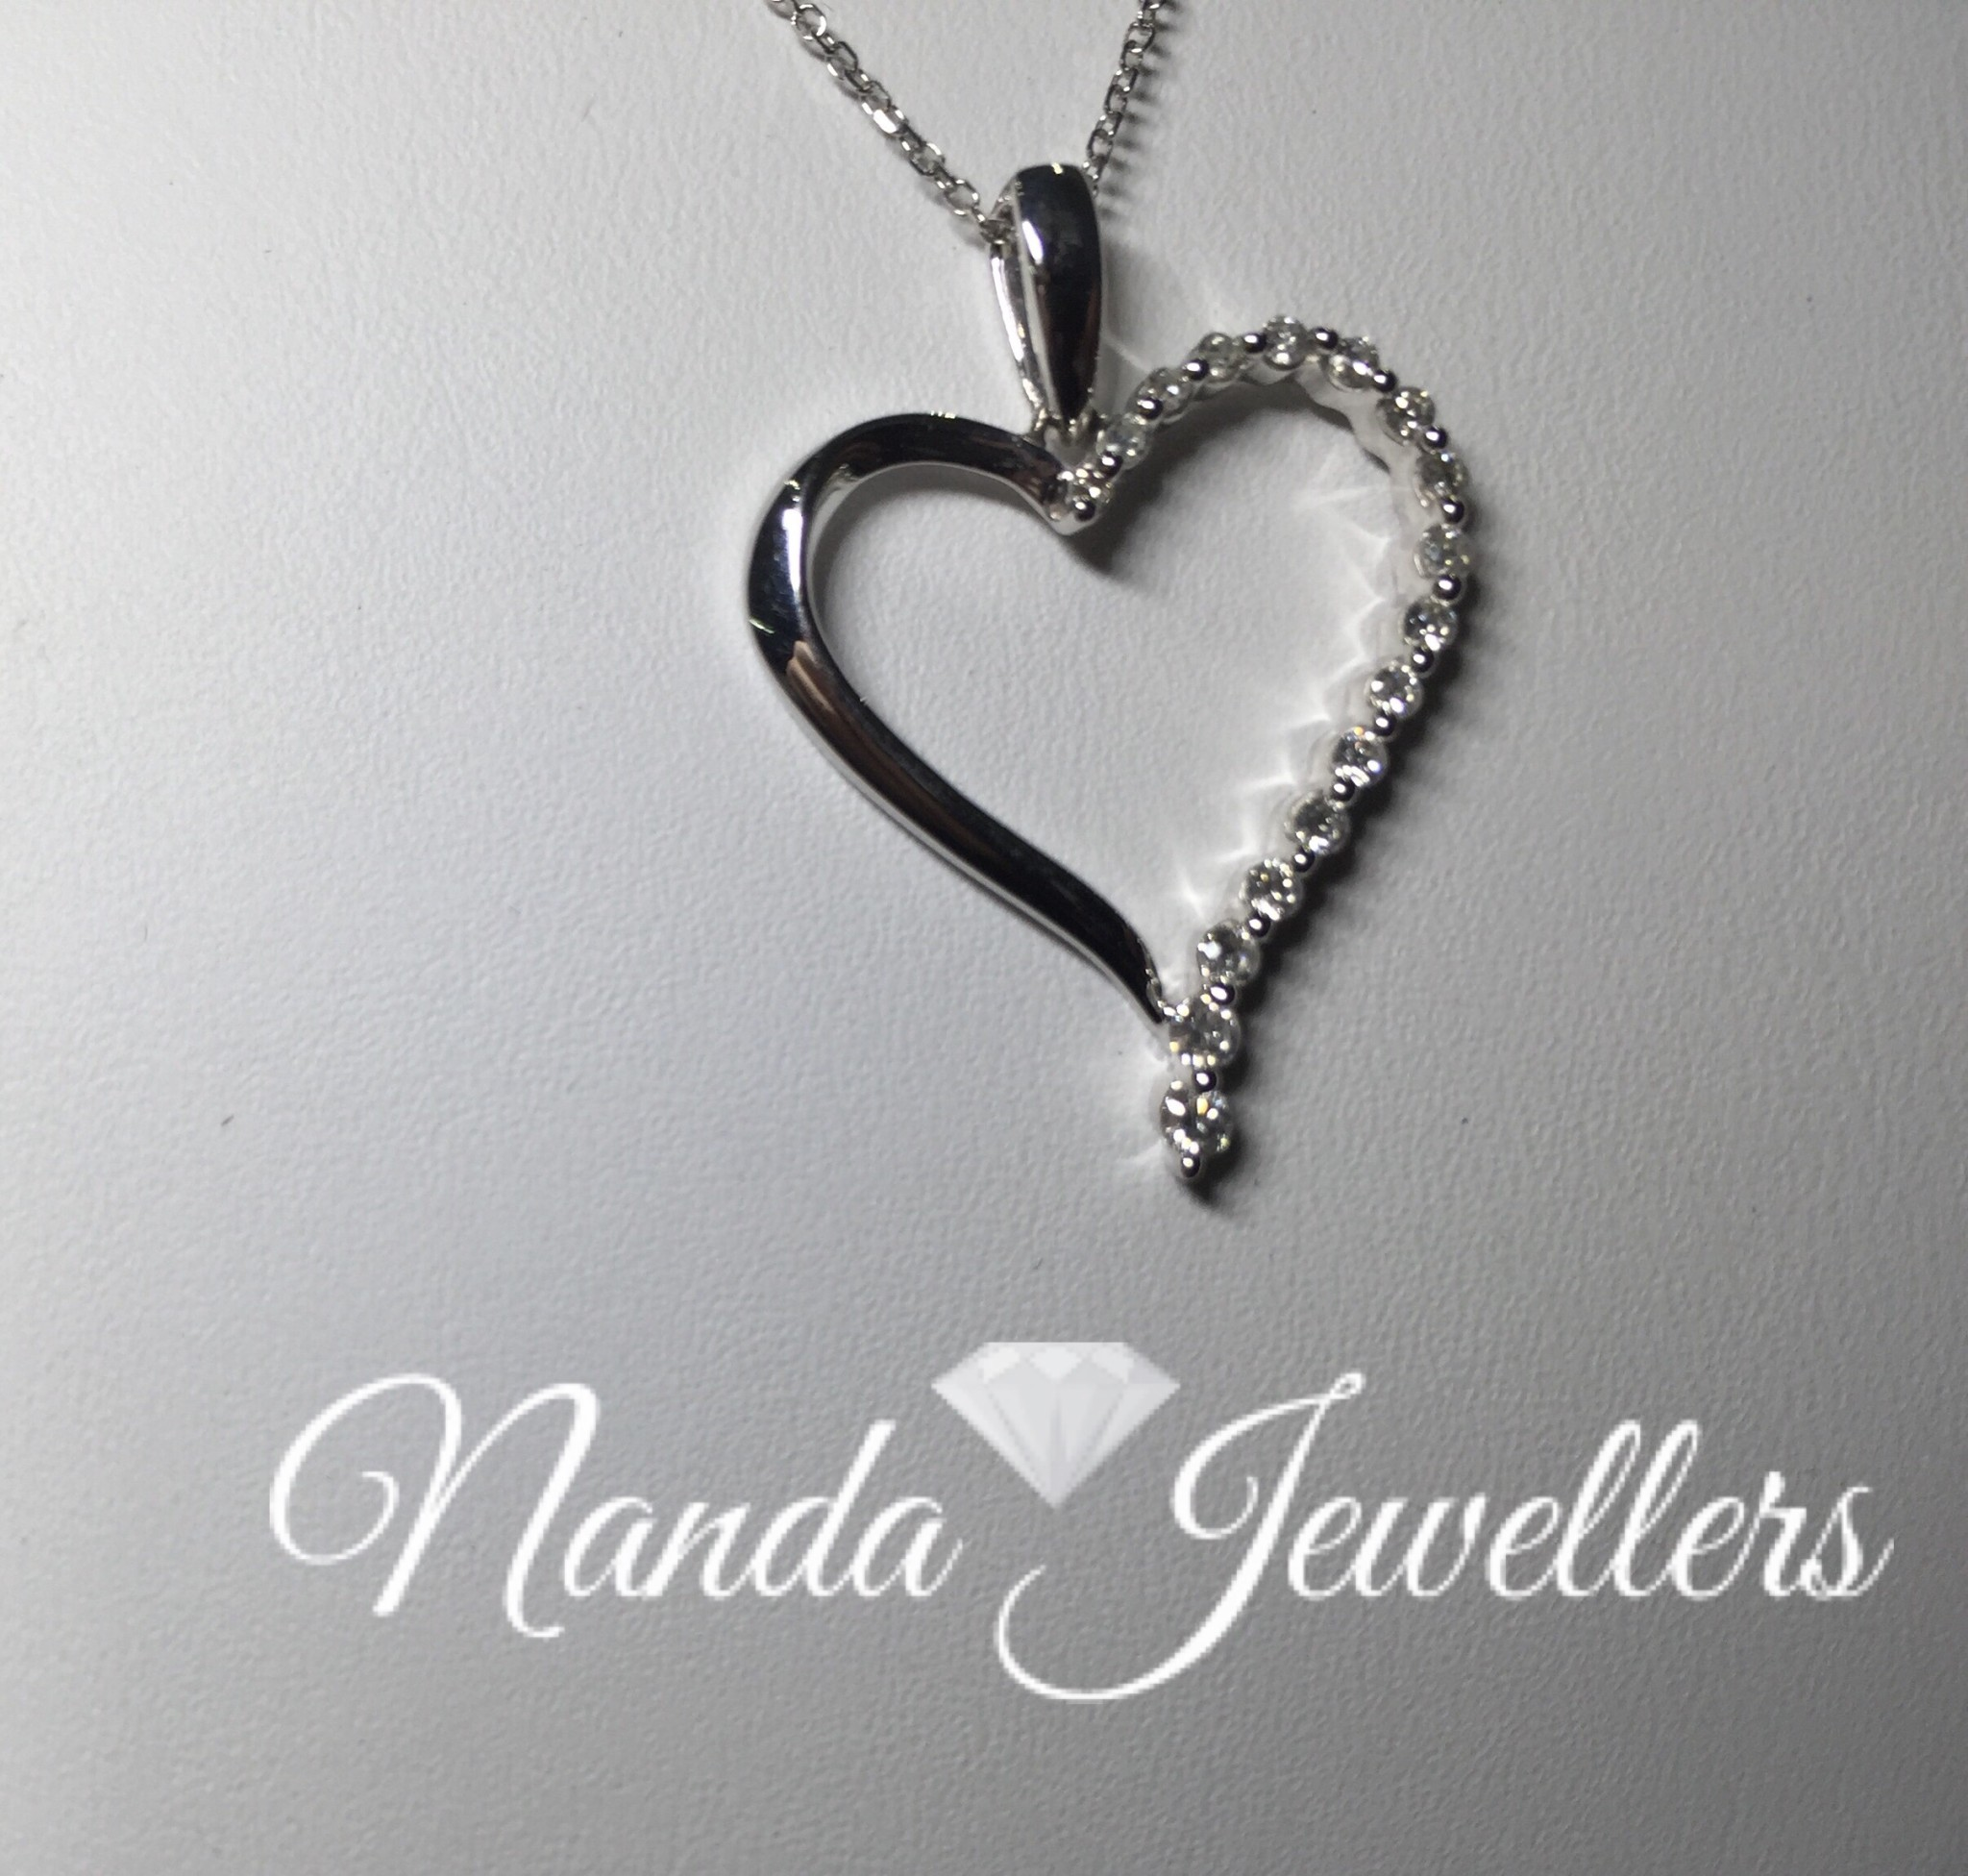 Diamond heart pendant/Nanda Jewellers